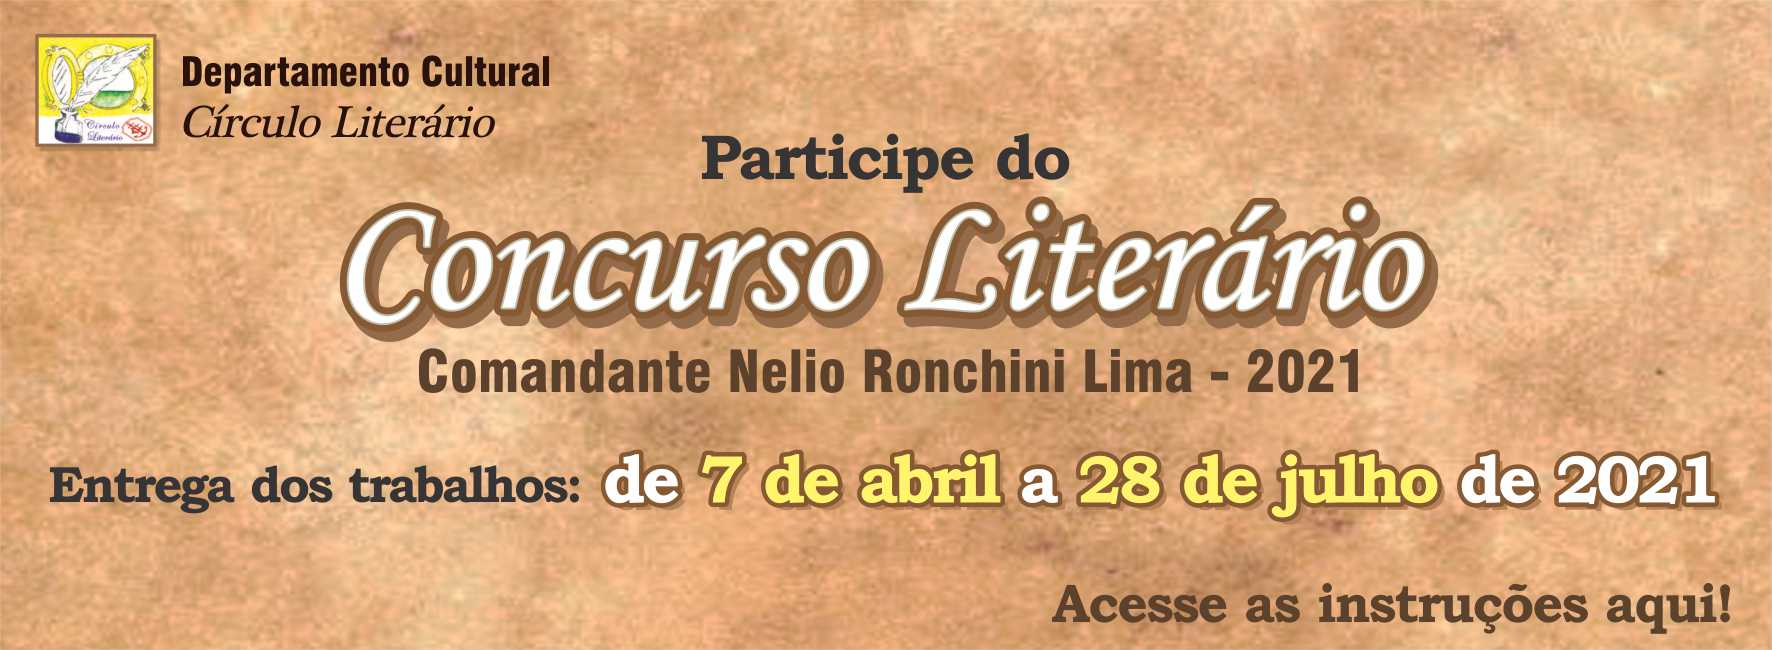 https://www.clubenaval.org.br/novo/?q=concurso-liter%C3%A1rio-comandante-n%C3%A9lio-ronchini-lima-2021